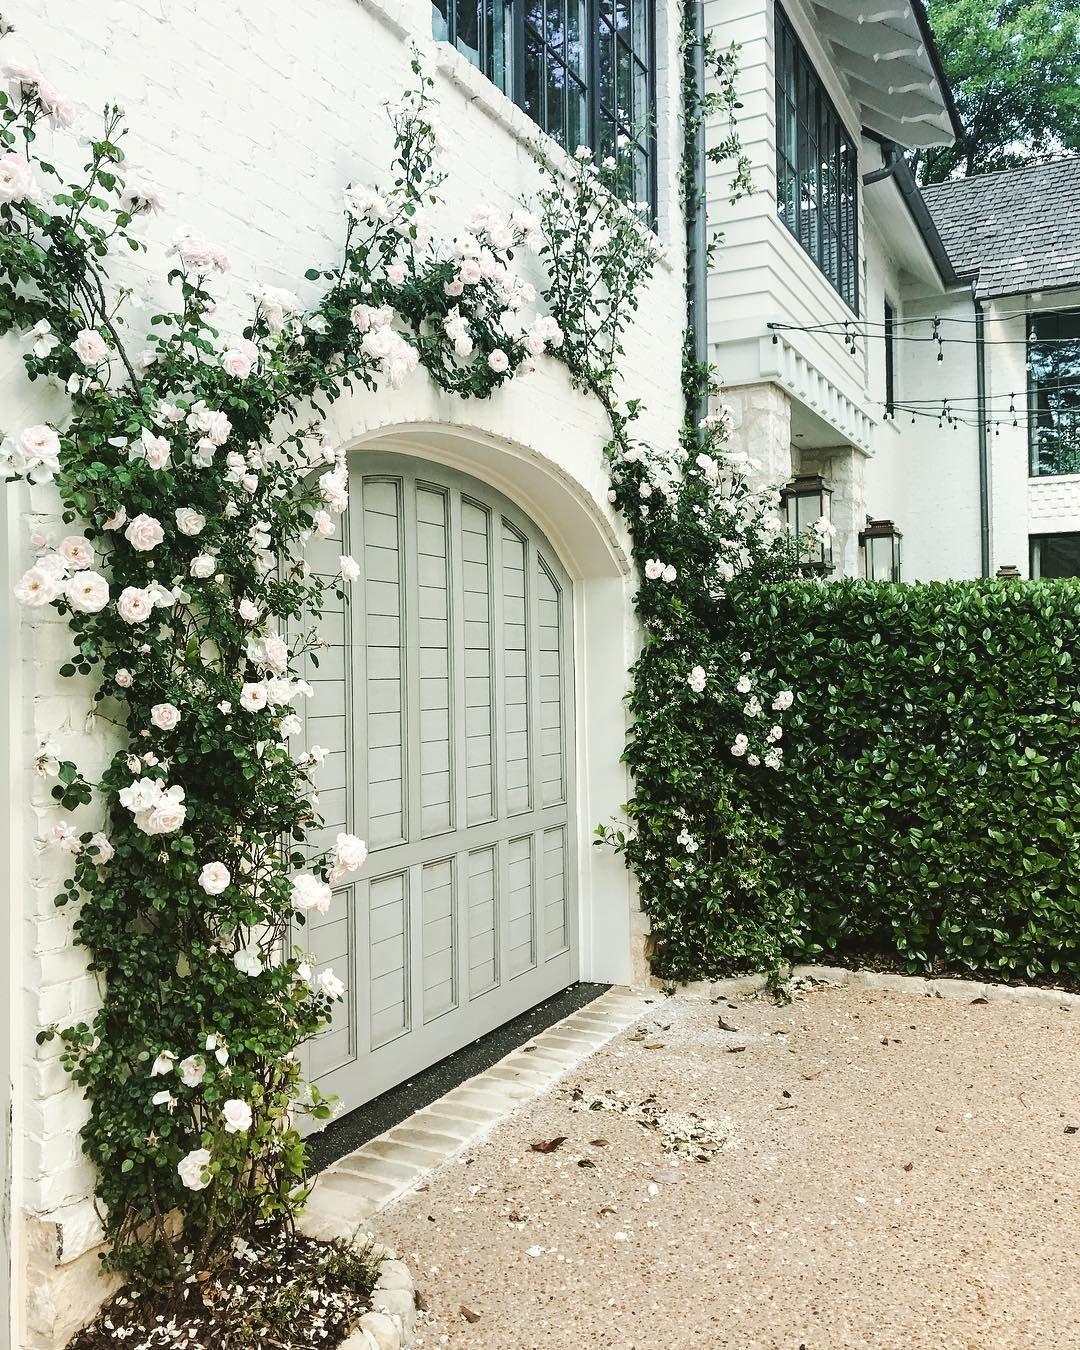 Bm Coventry Gray Garage Door Design Garage Doors White Exterior Houses